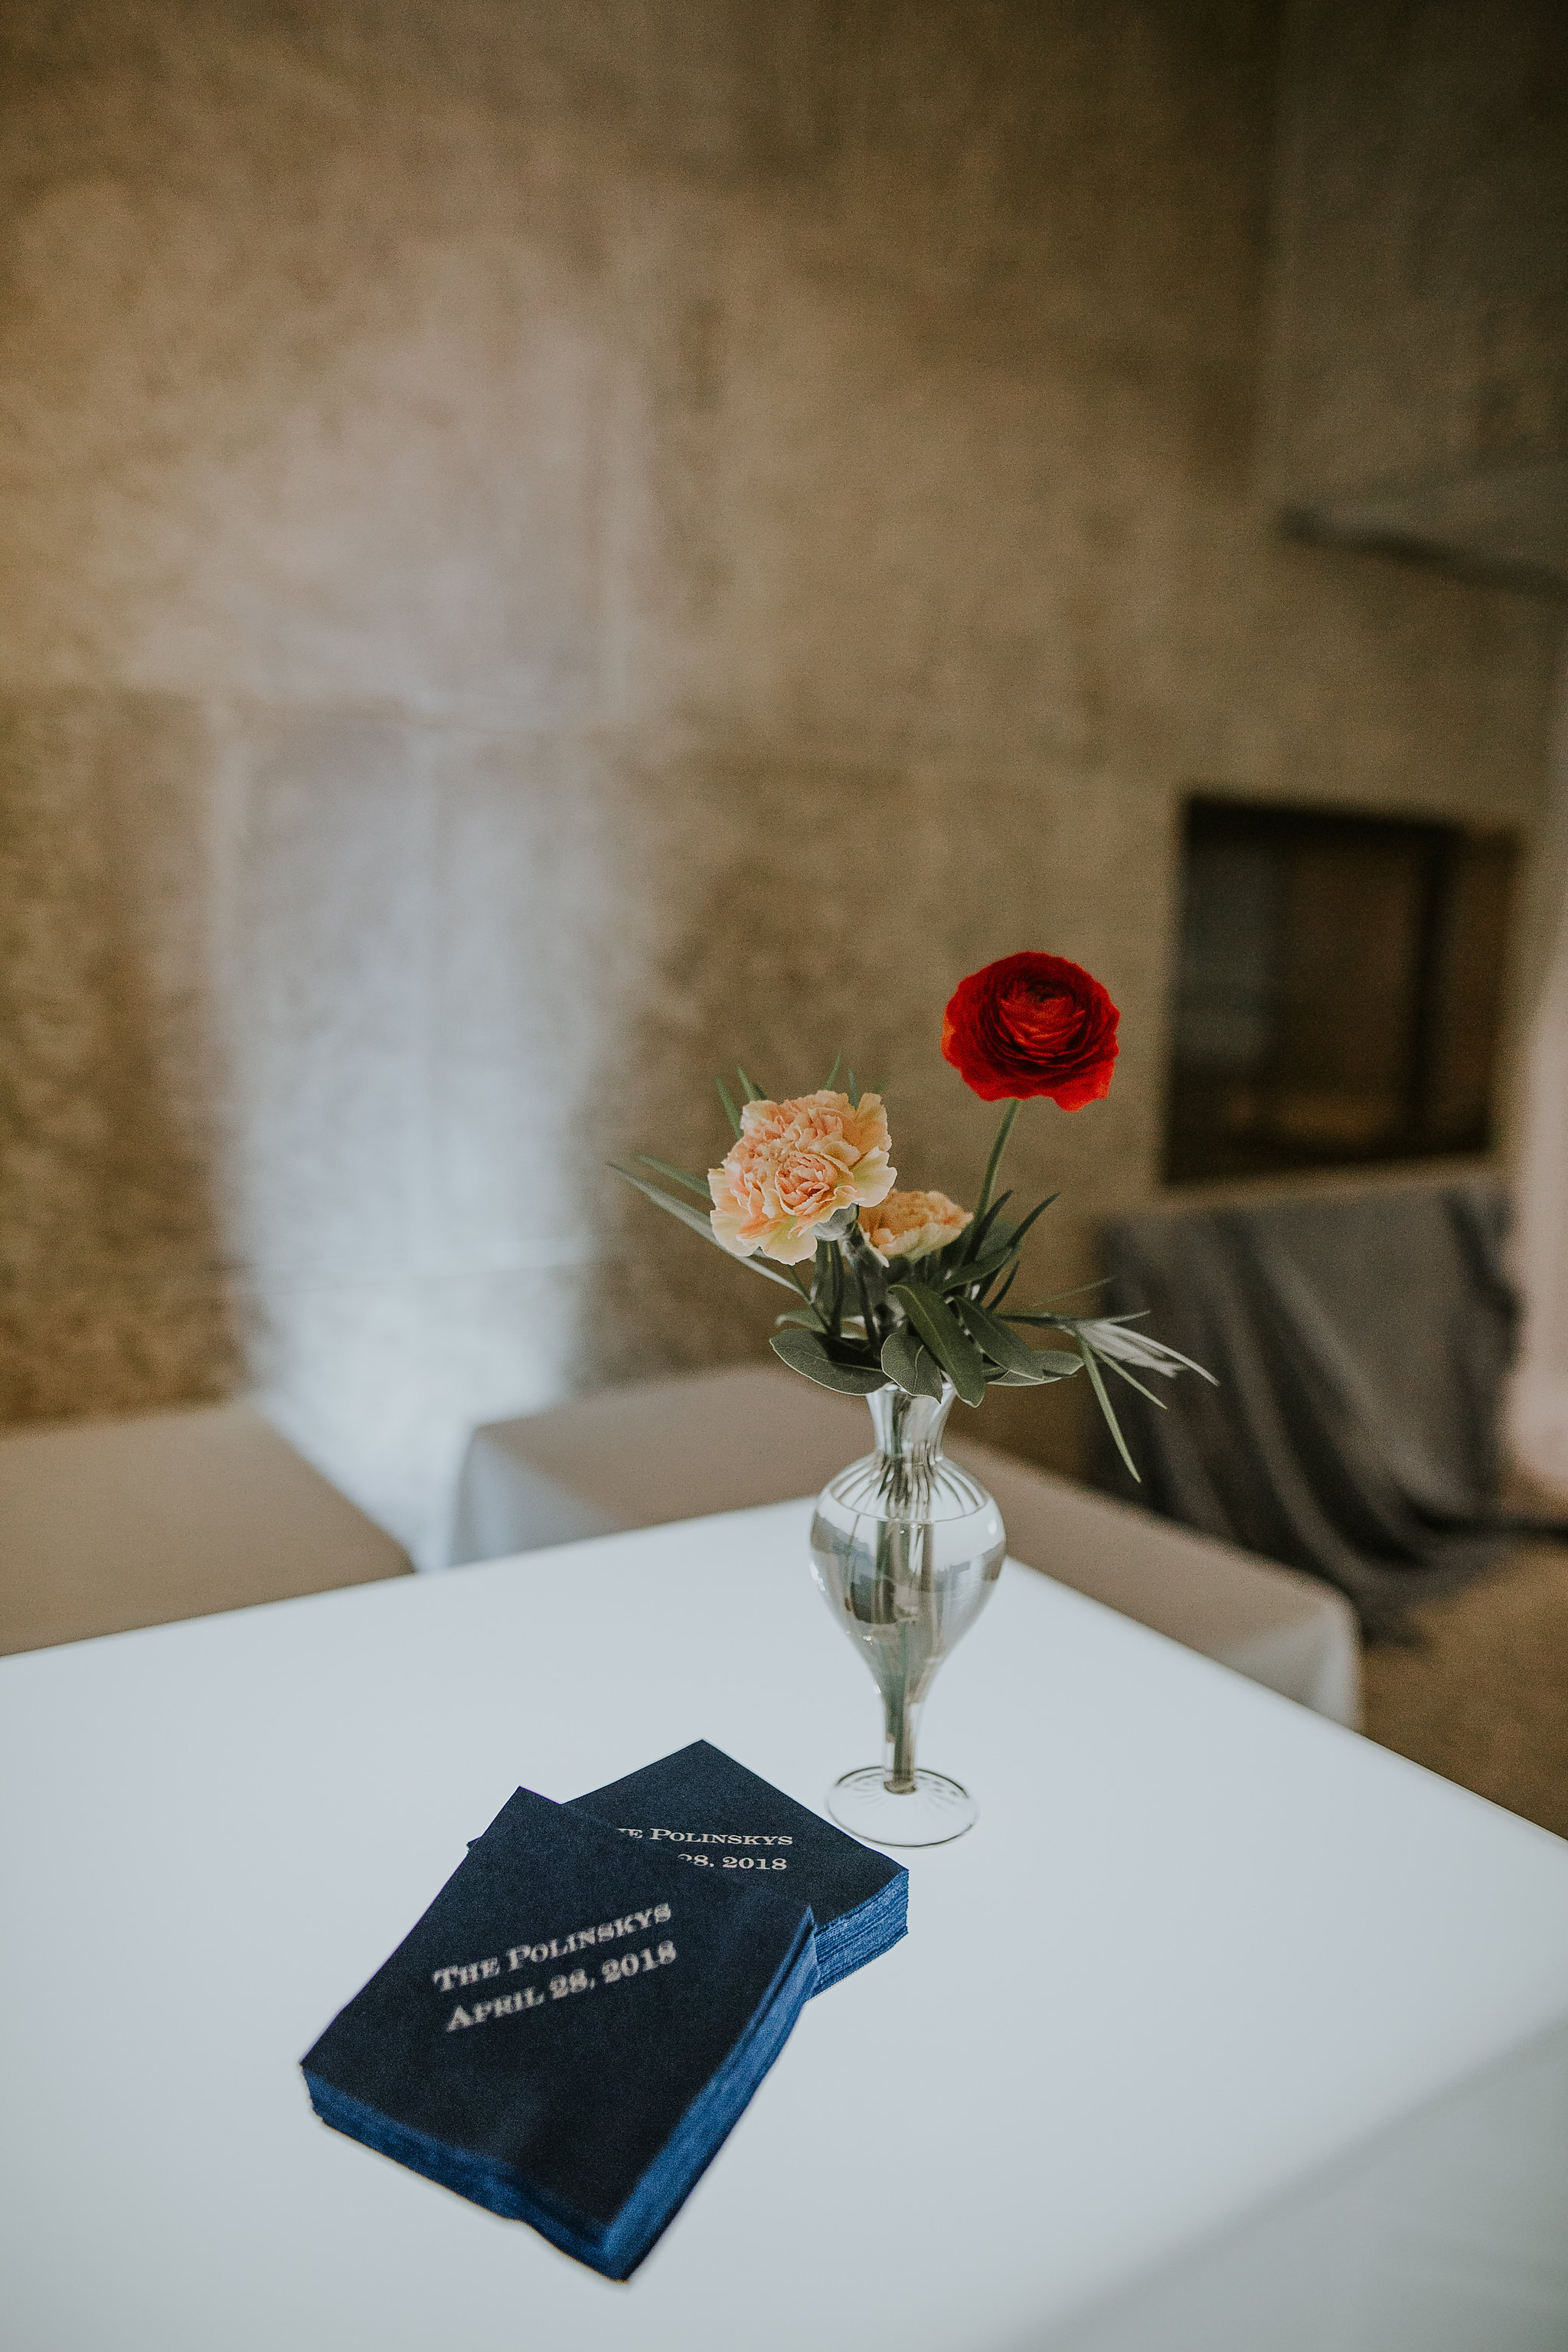 Modern Wedding Details - Creative Wedding Decor Ideas